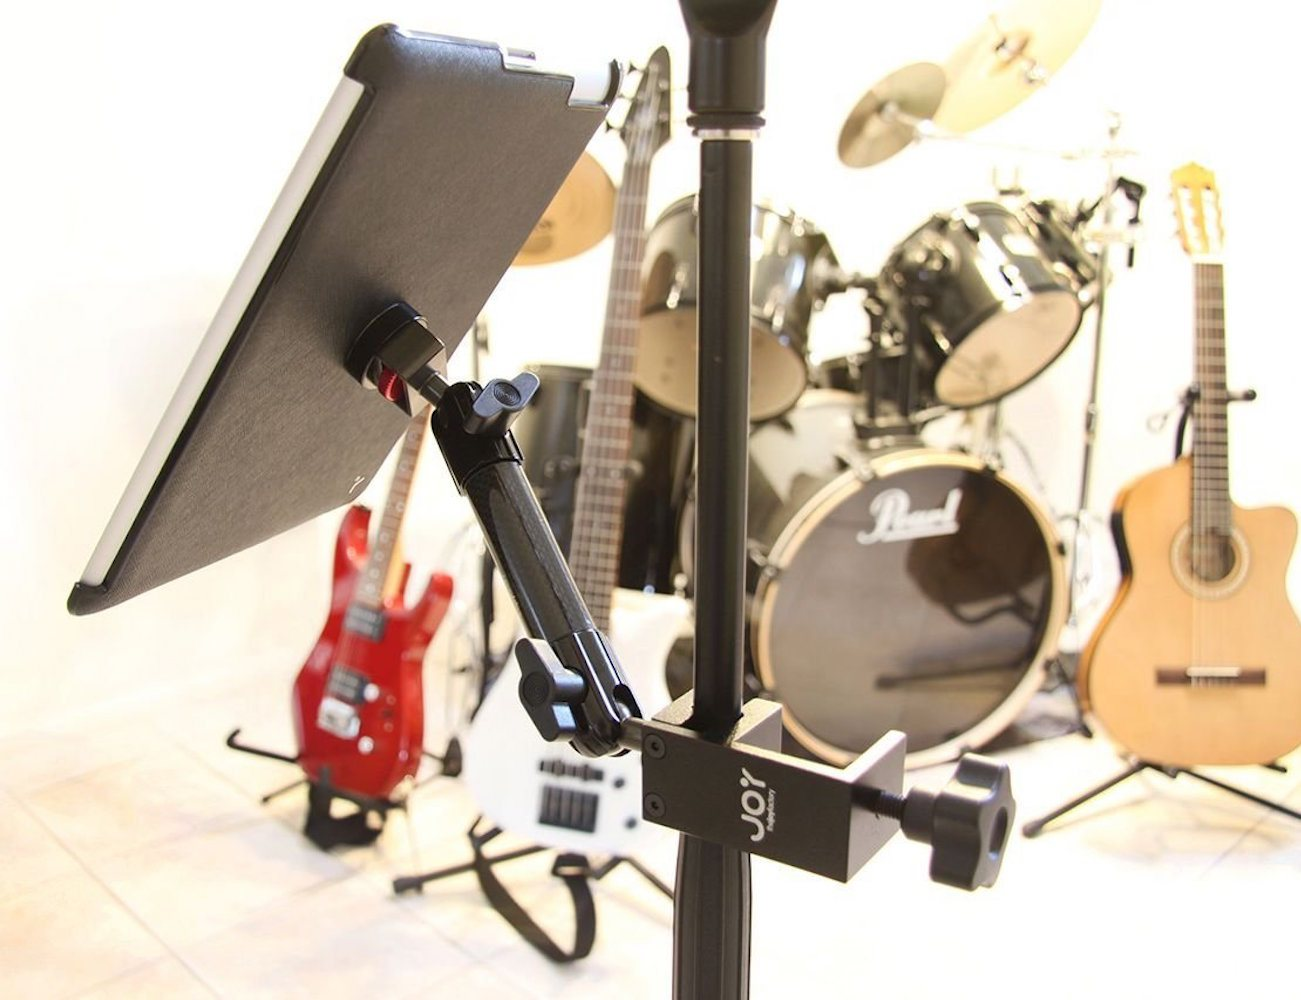 The Joy Factory Tournez C-Clamp Mount for iPad